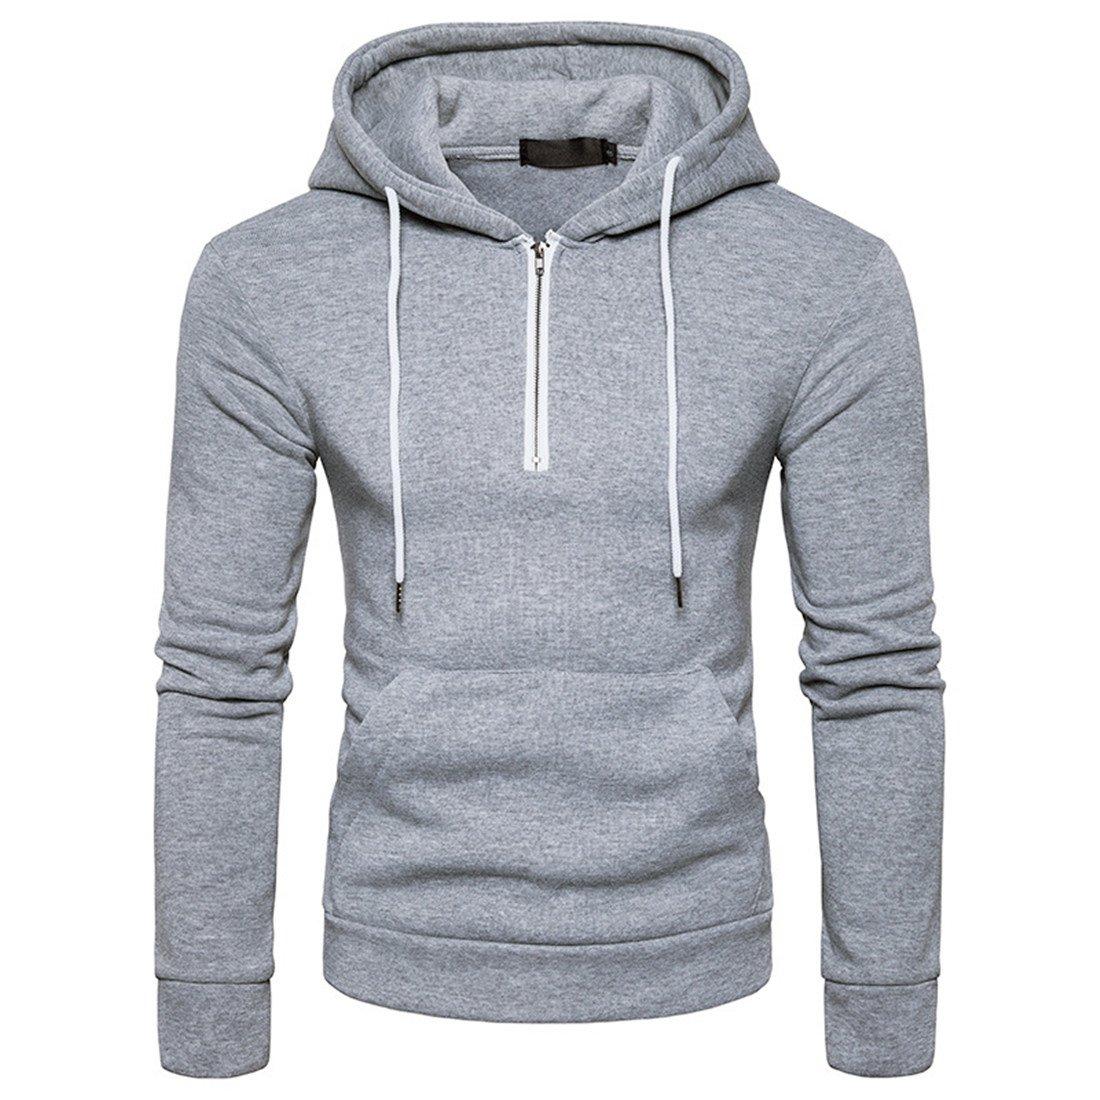 uninukoo-men clothes Unko Mens Fashion Quarter Zip Drawstring Hoodies Pullover Sweatshirt